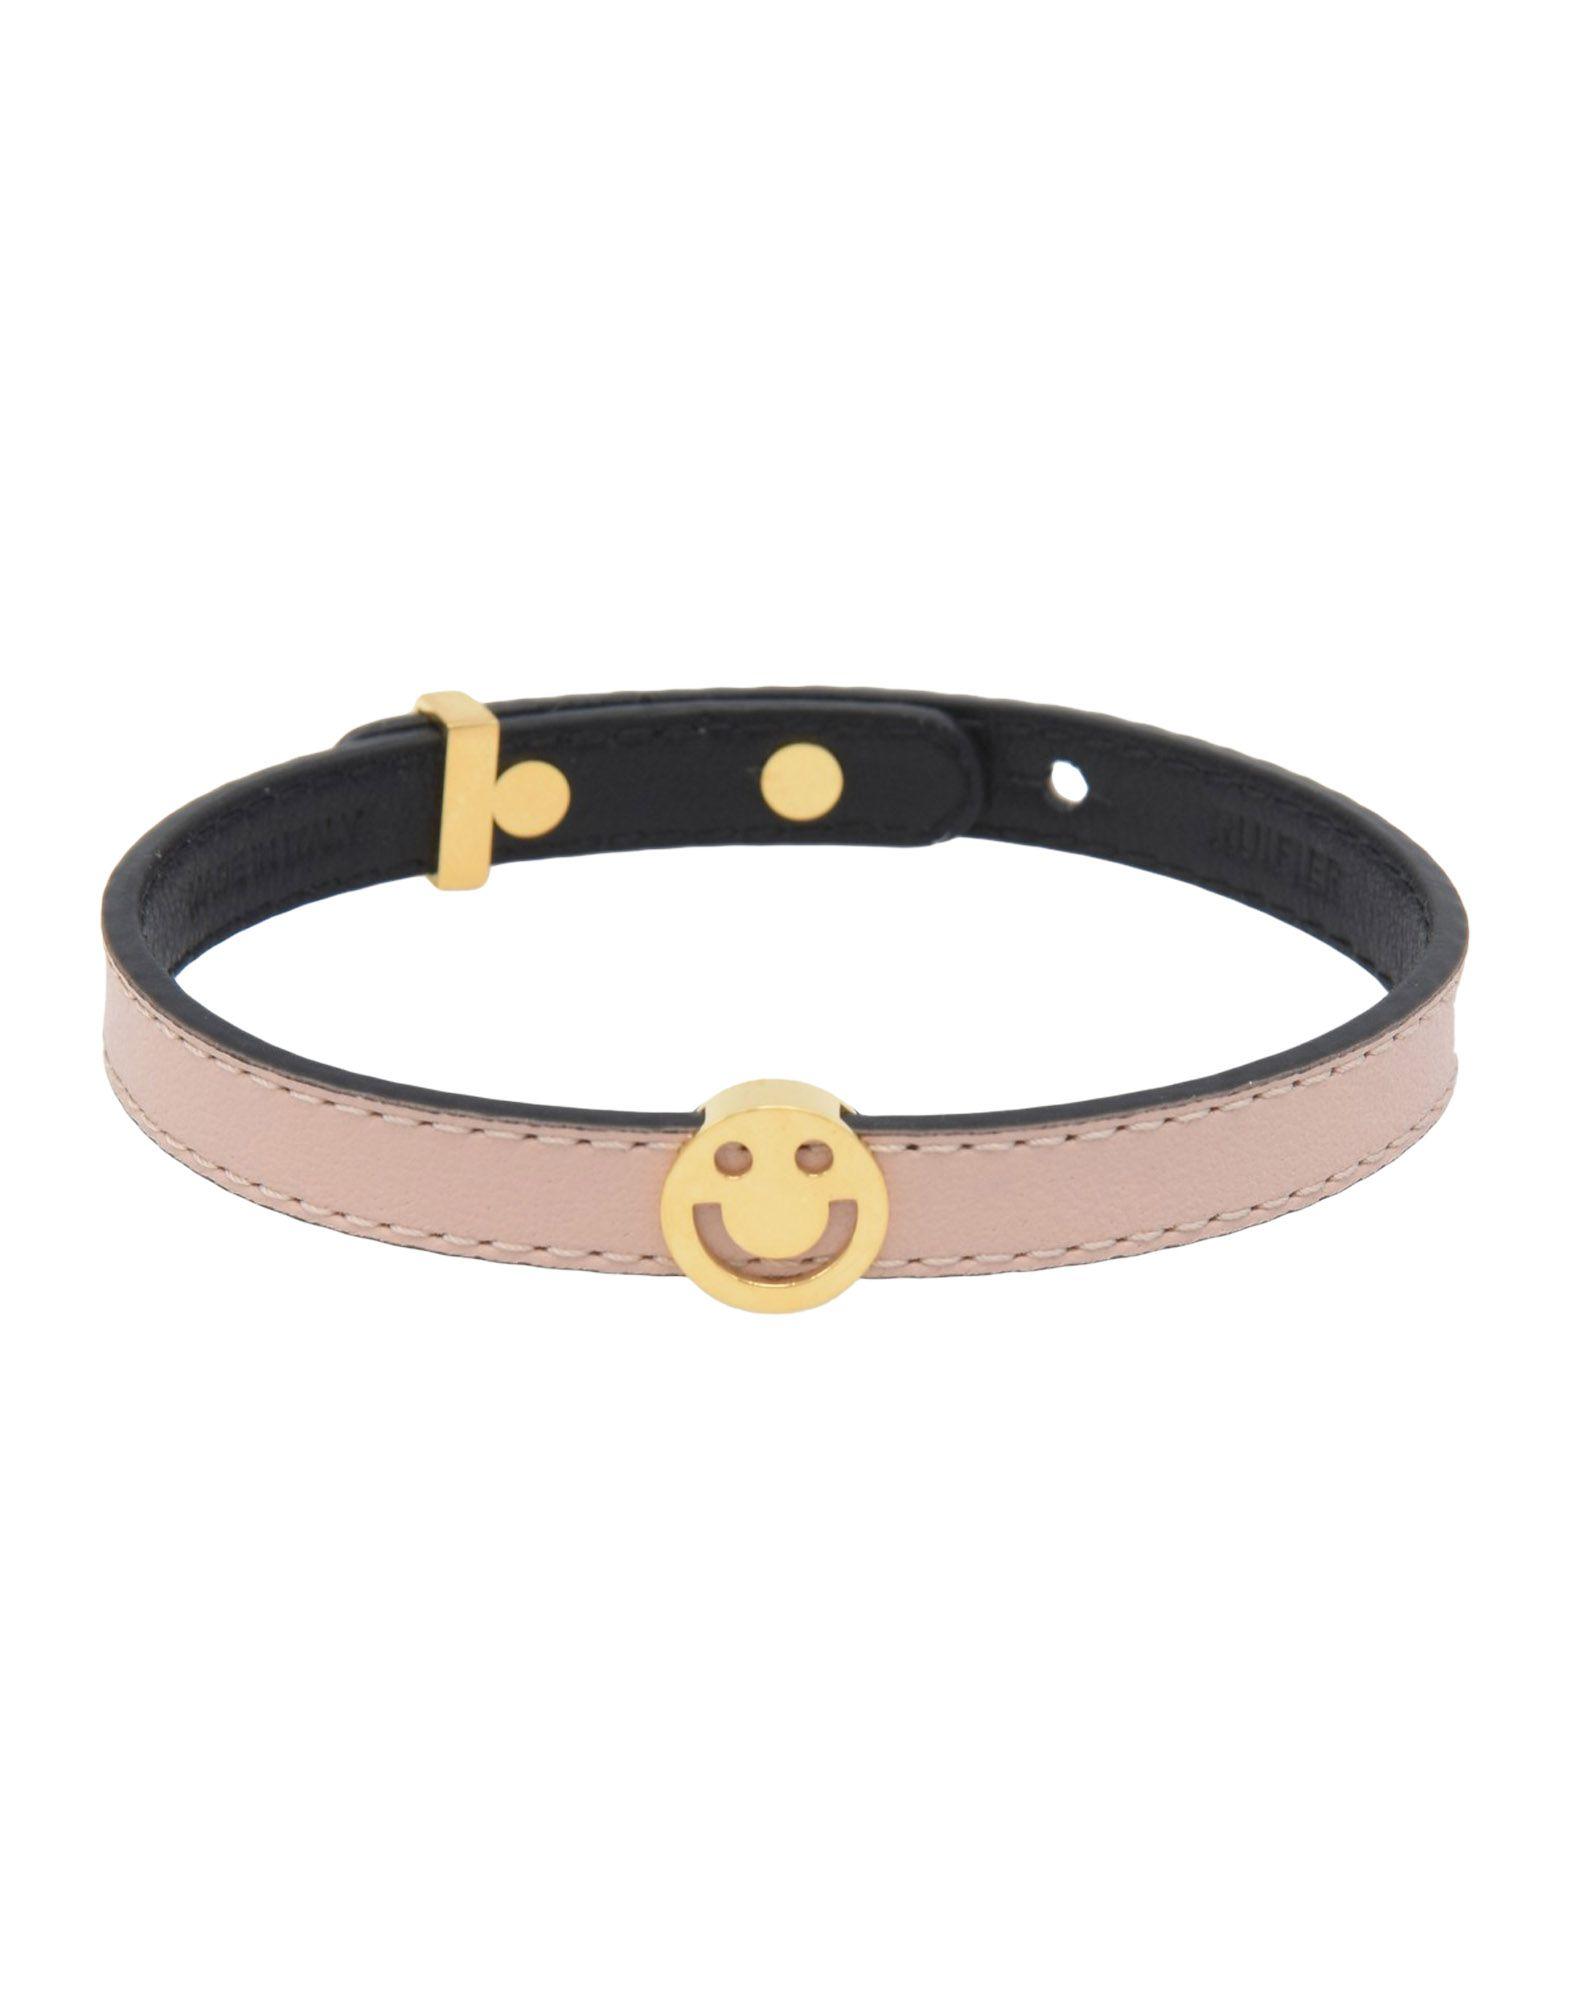 Bracciale Ruifier Pick Me Bracelet Happy_Nude - Uomo - Acquista online su